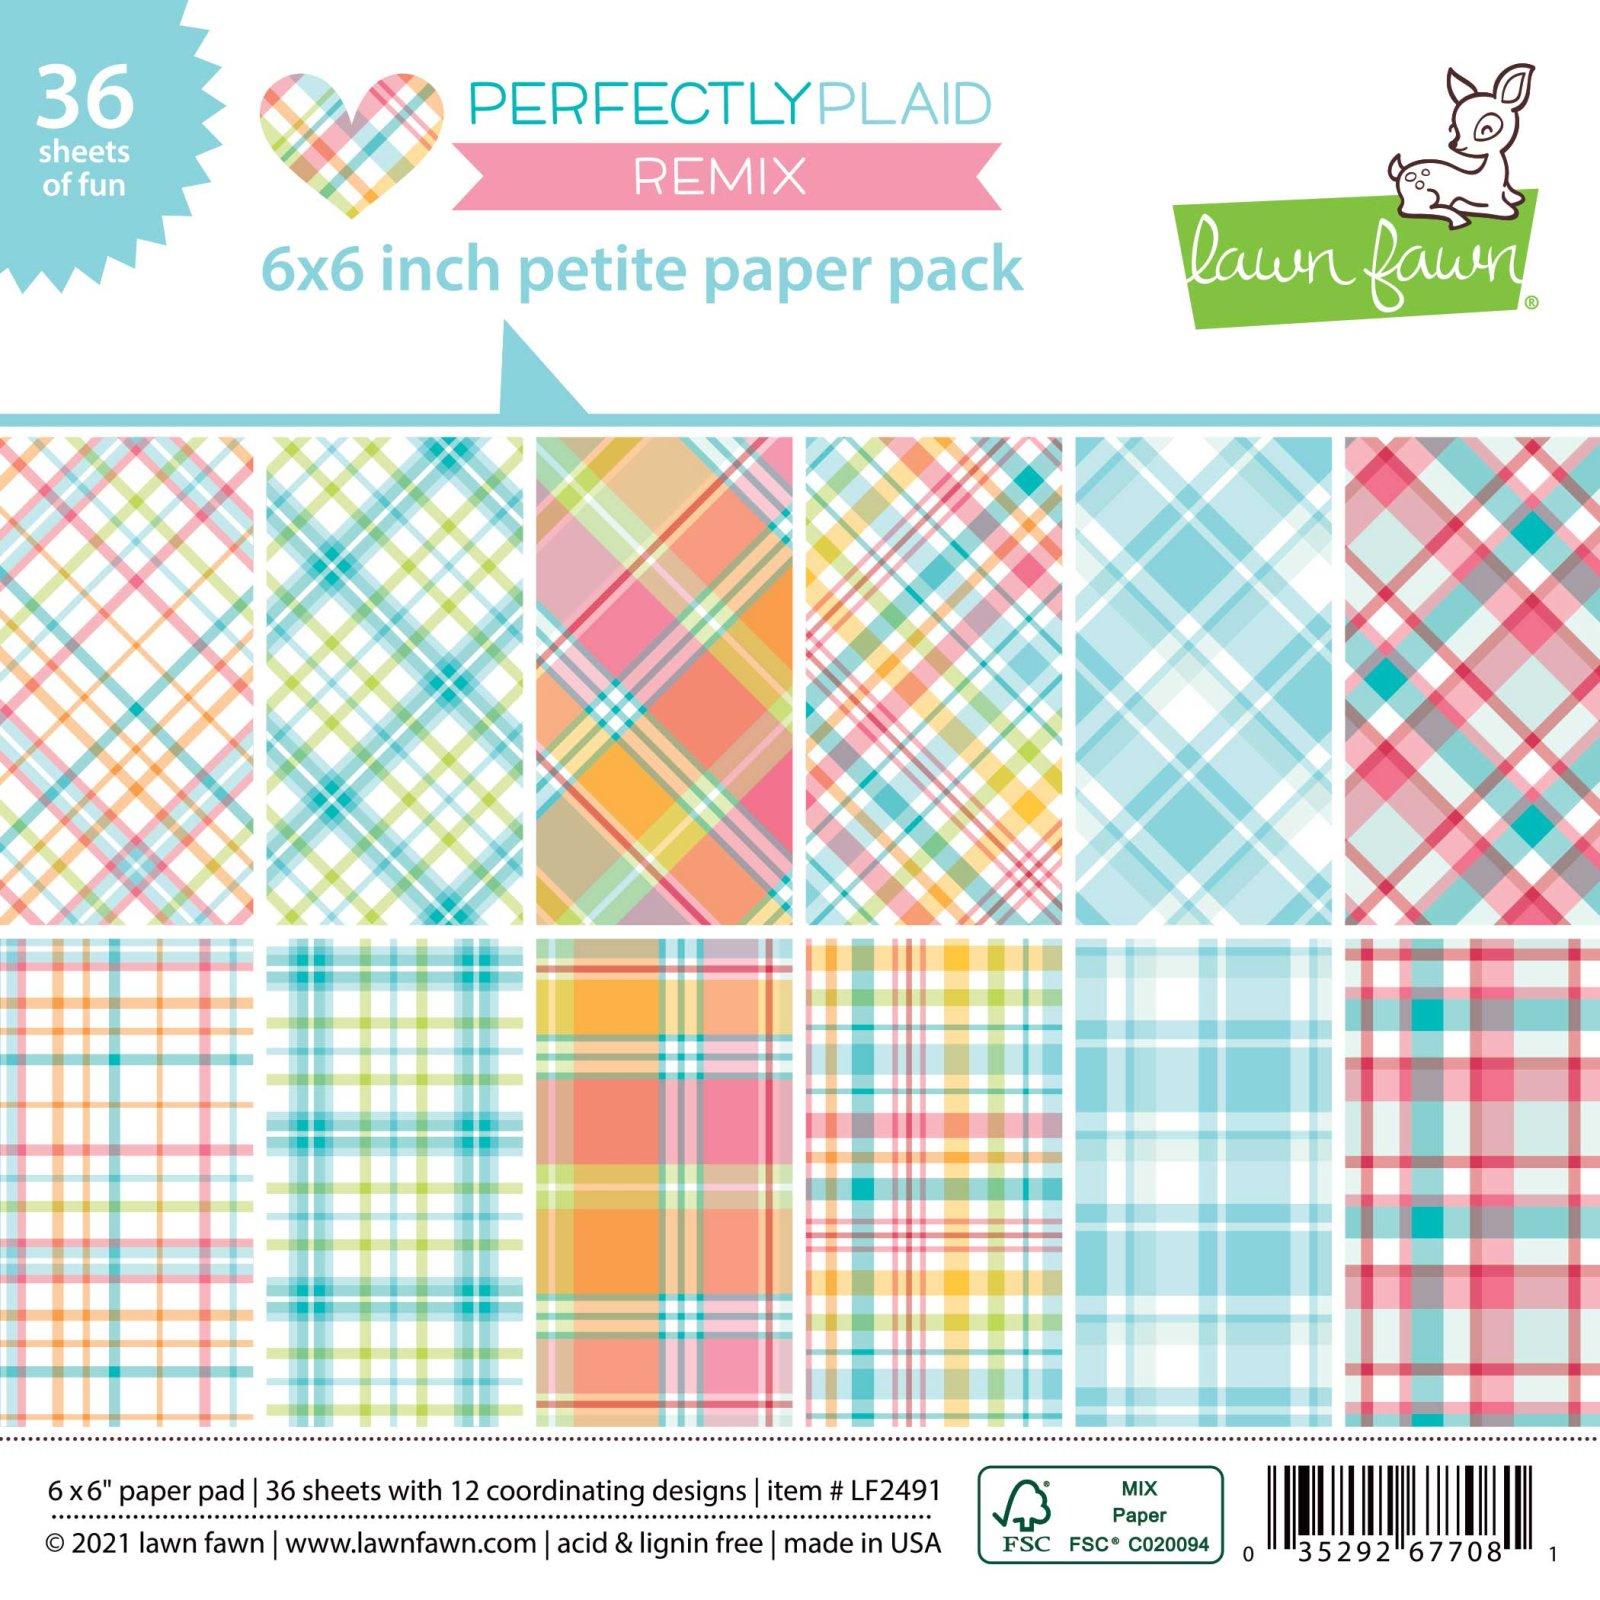 Perfectly Plaid Remix 6x6 petite paper pad